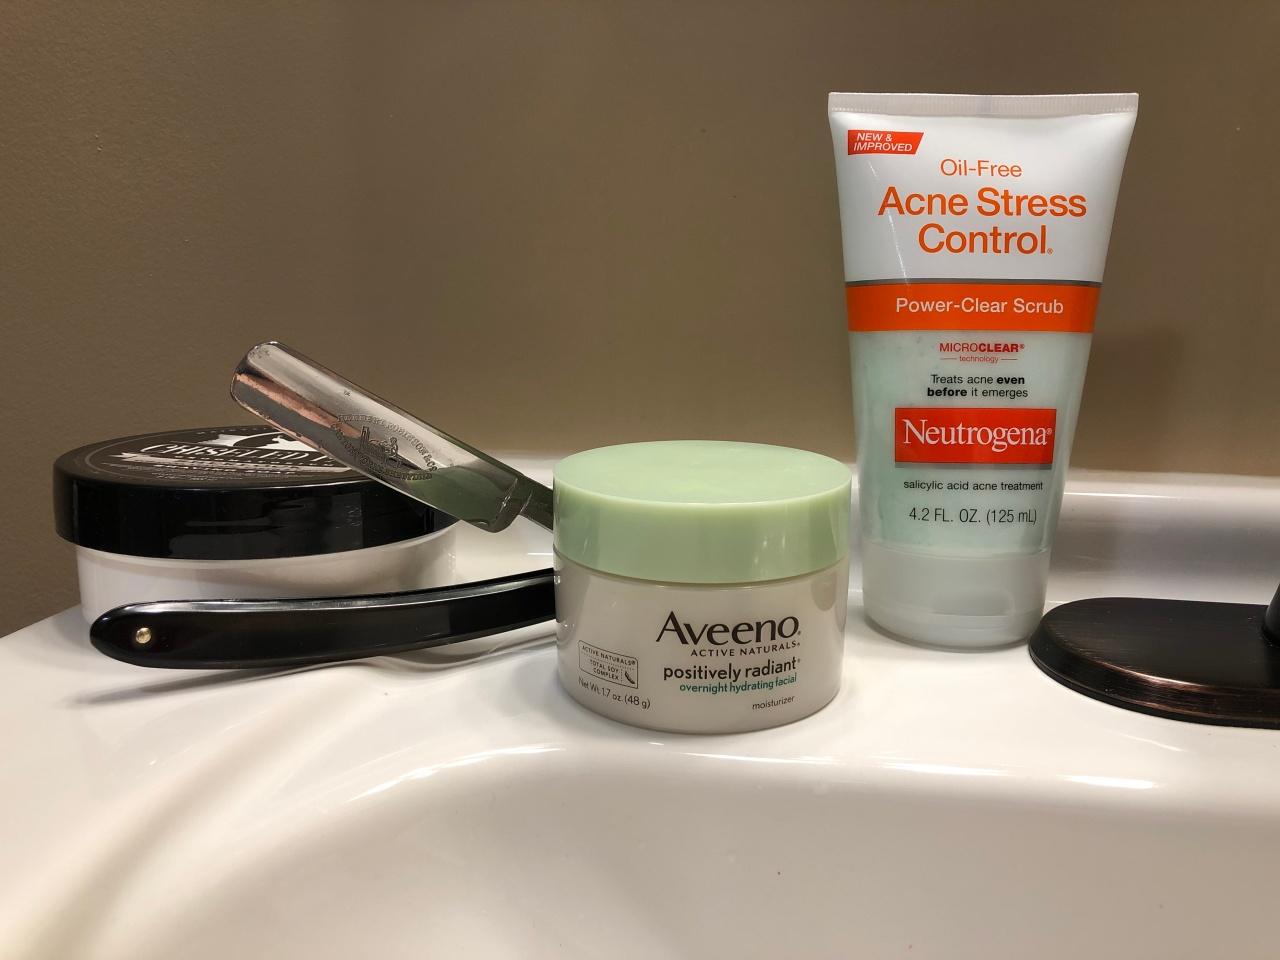 Adding salicylic acid and night cream to your shaving regimen